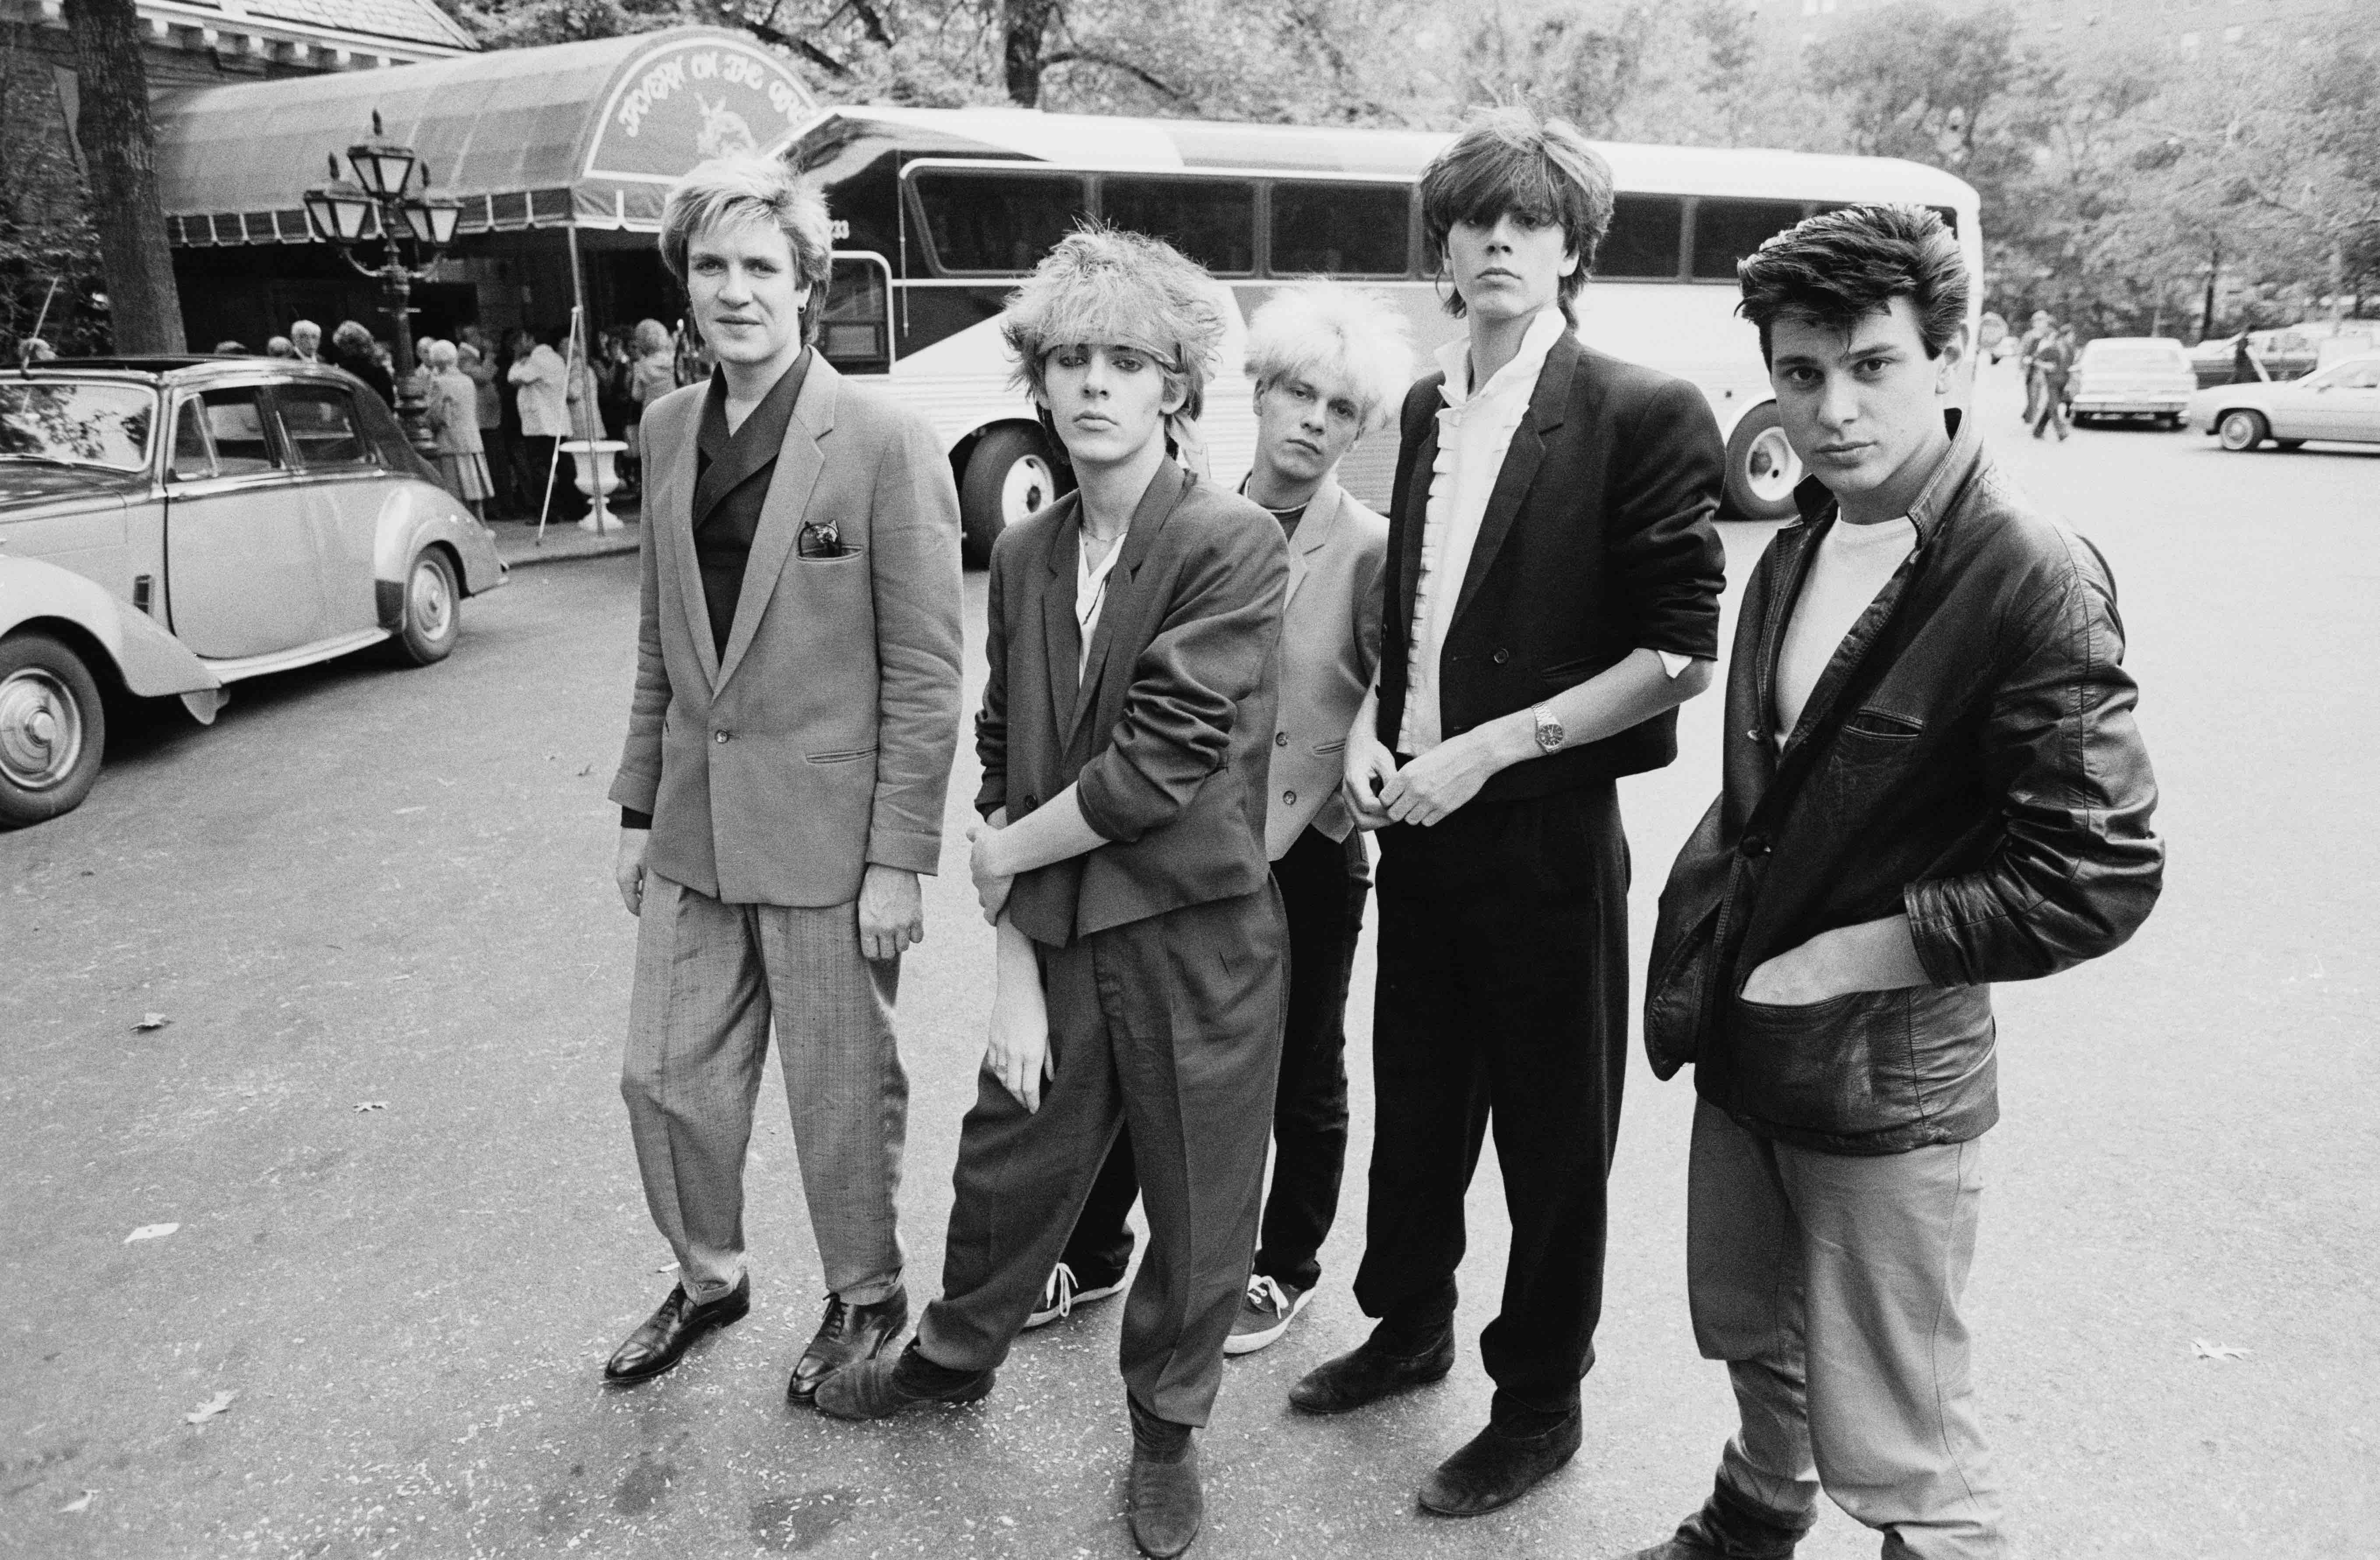 Duran Duran in New York, 1981